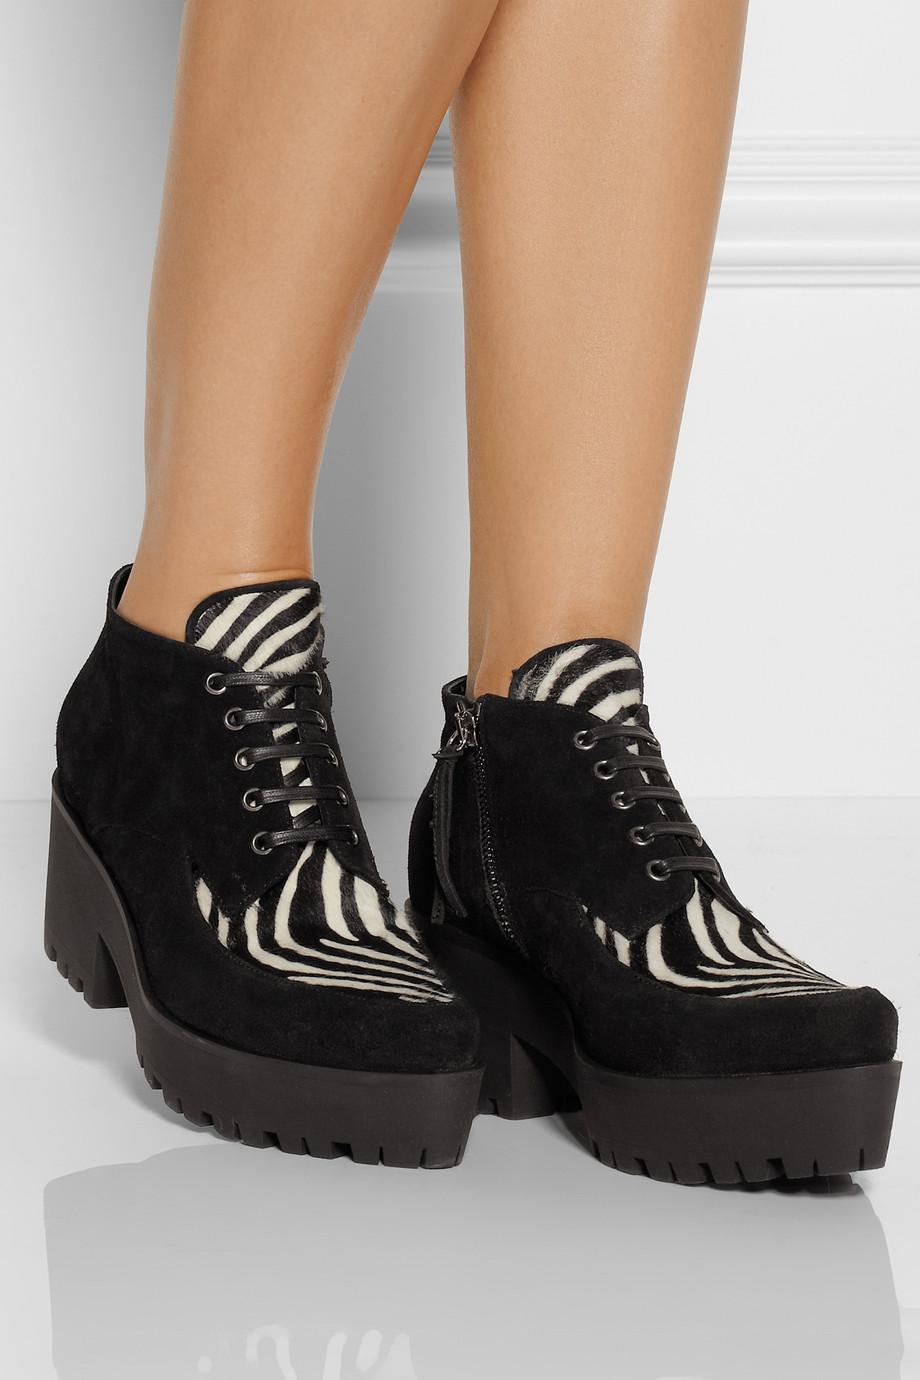 Fugly Shoe Trends - ChiCityFashion: The Chicago Fashion Blog